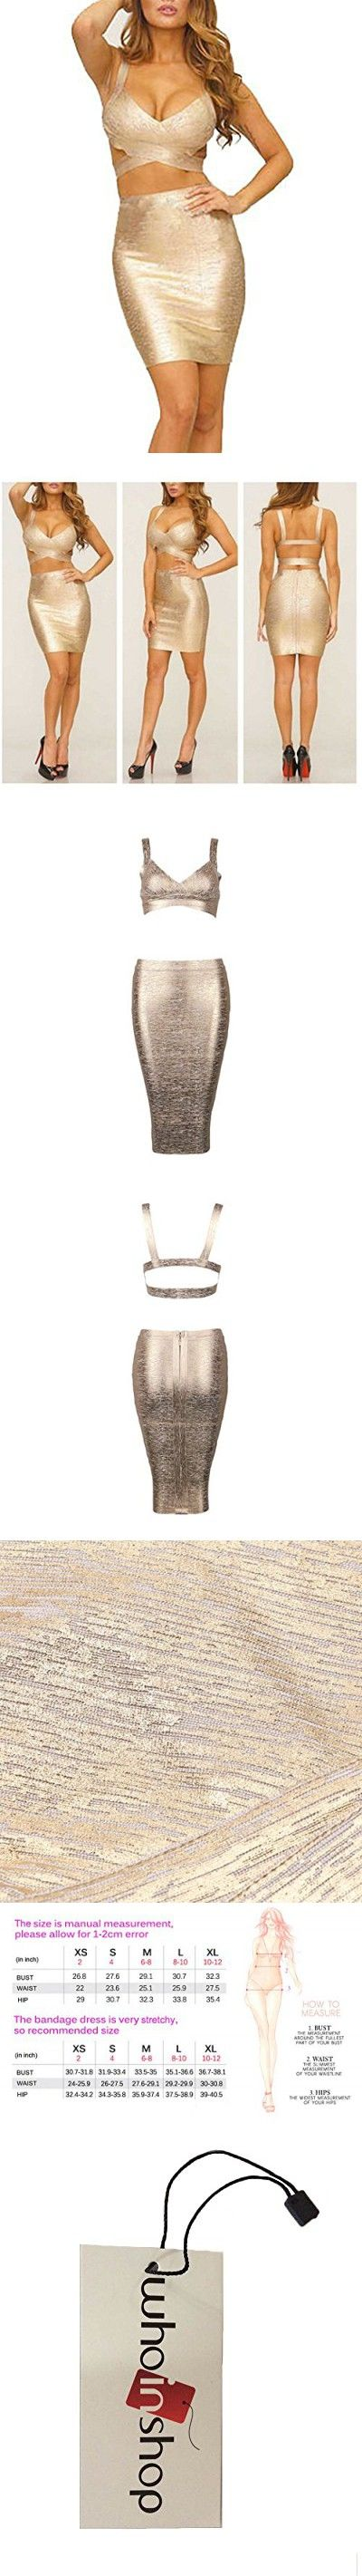 9213a97c0cc Whoinshop Women's Bodycon Skirt Set 2 Pieces Sleeveless Celebrity Bandage  Dress